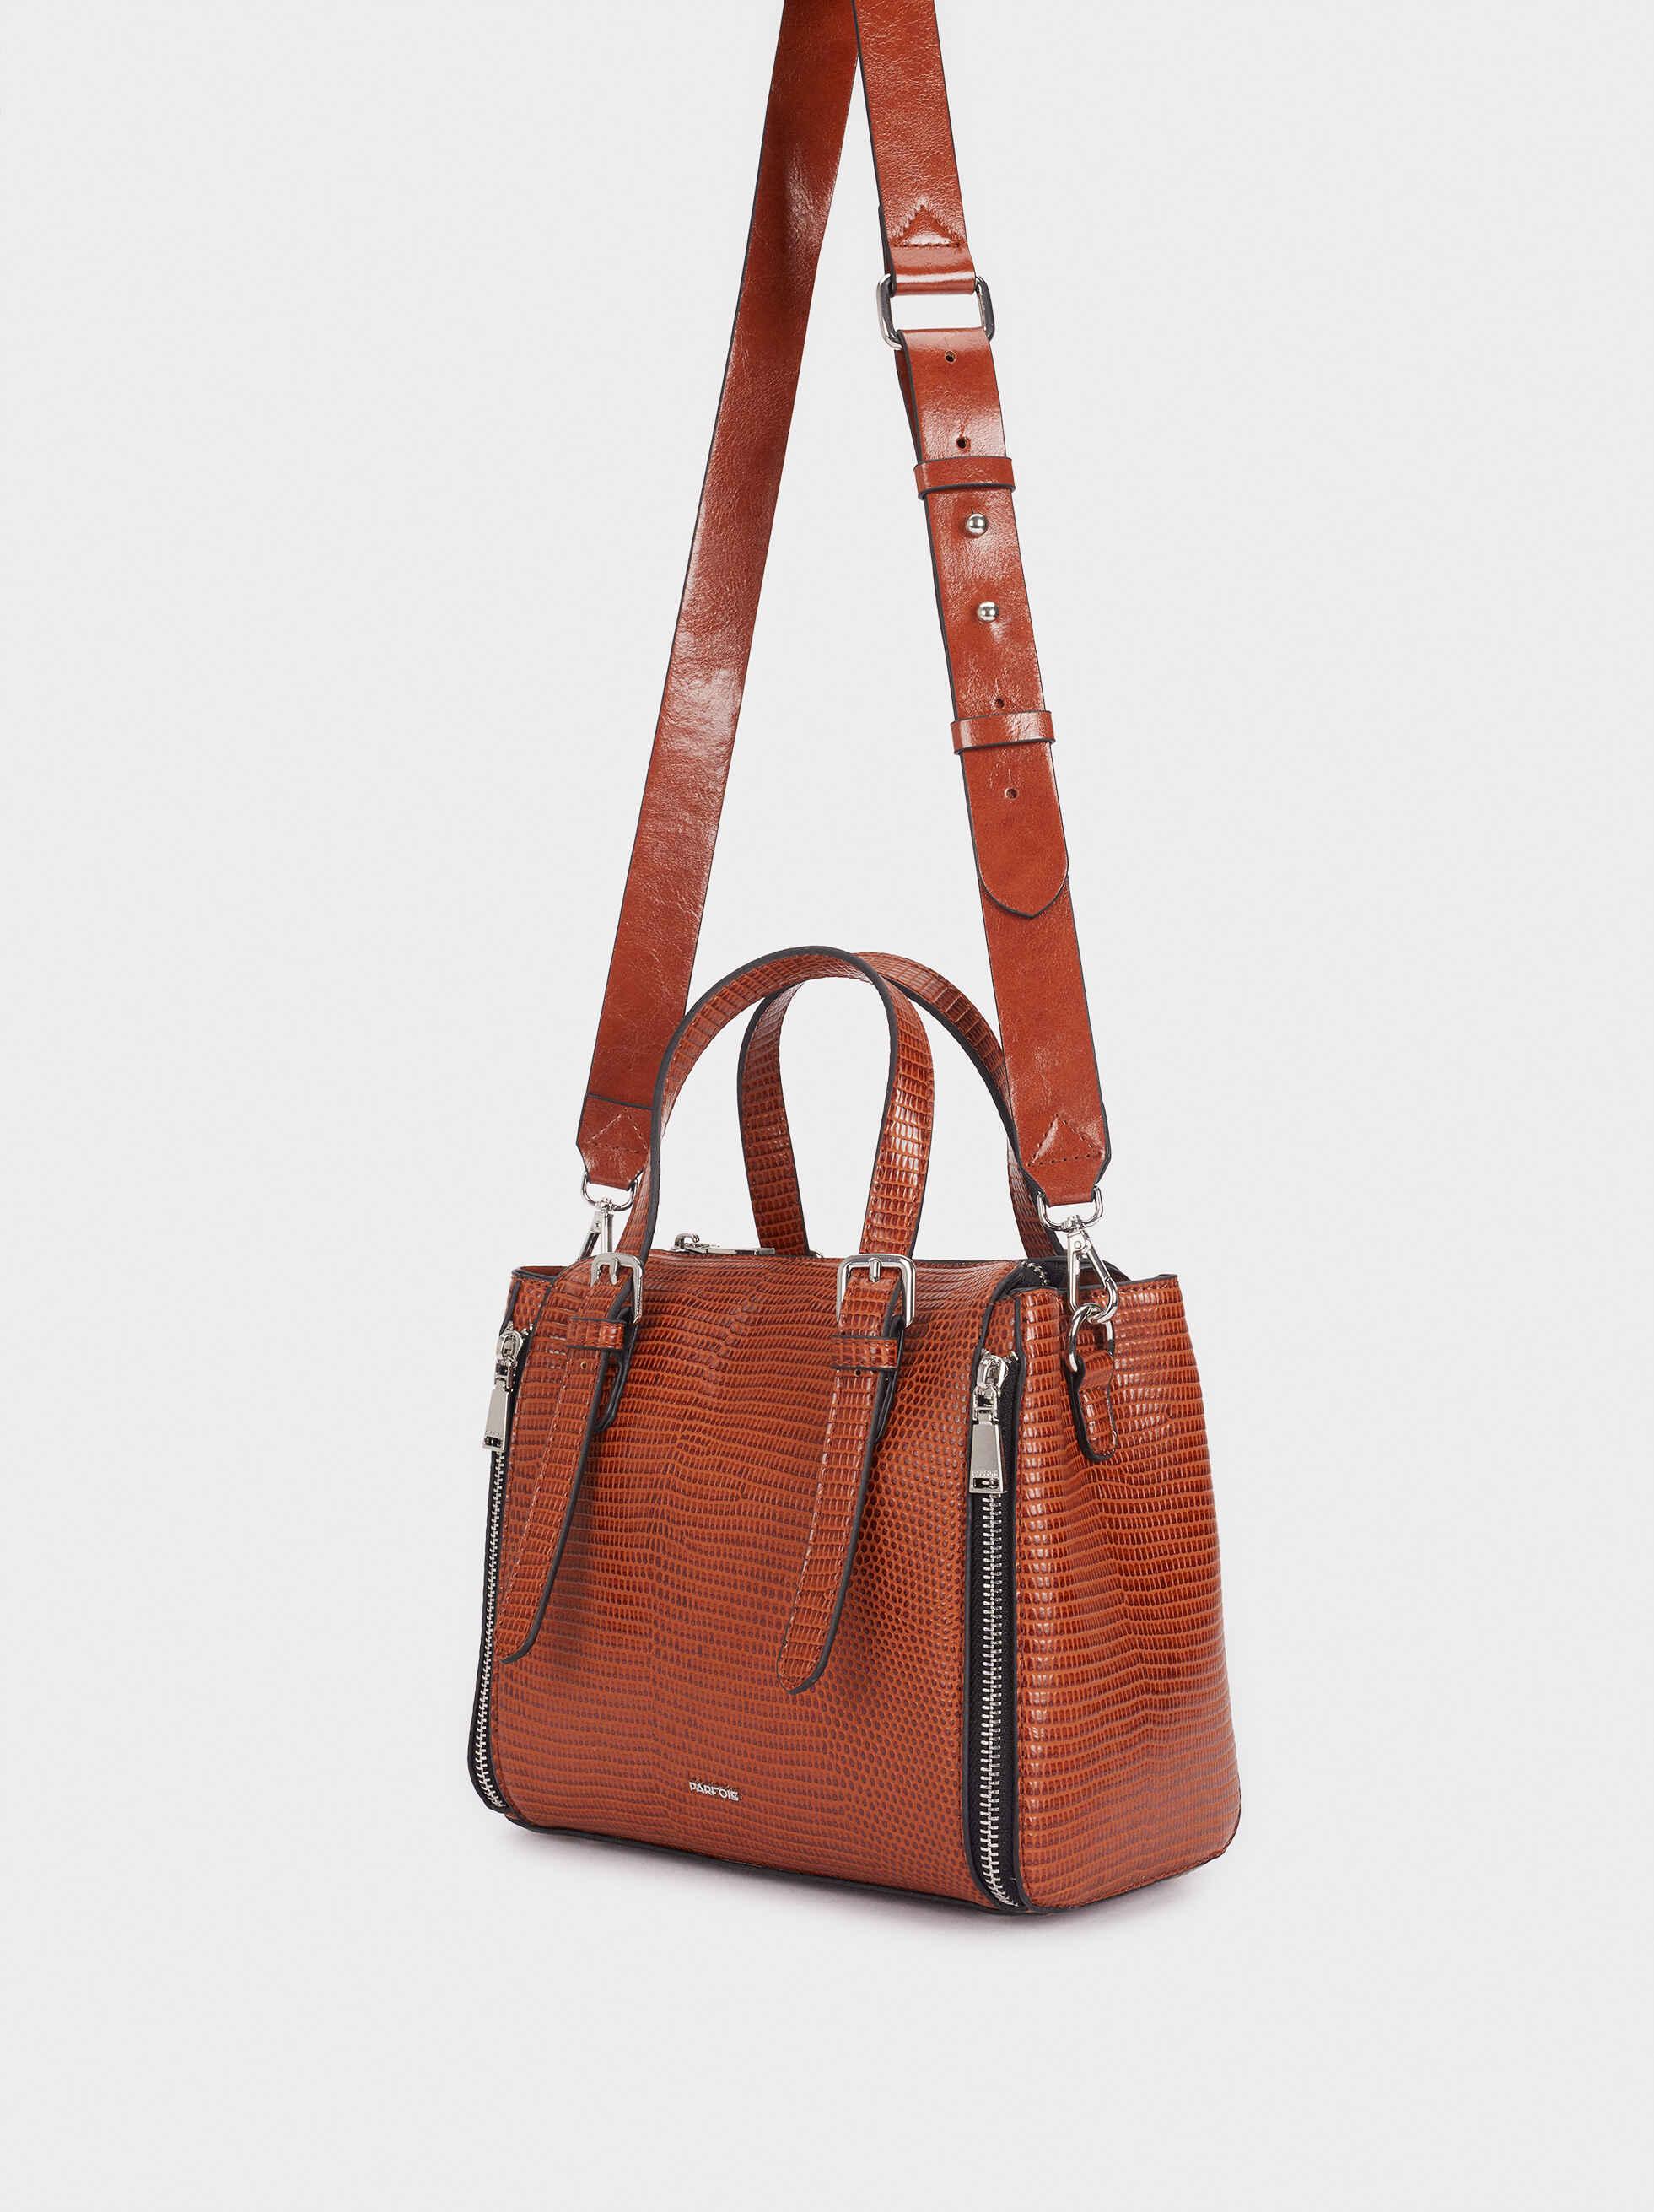 Embossed Animal Print Tote Bag With Zip Detailing, Camel, hi-res